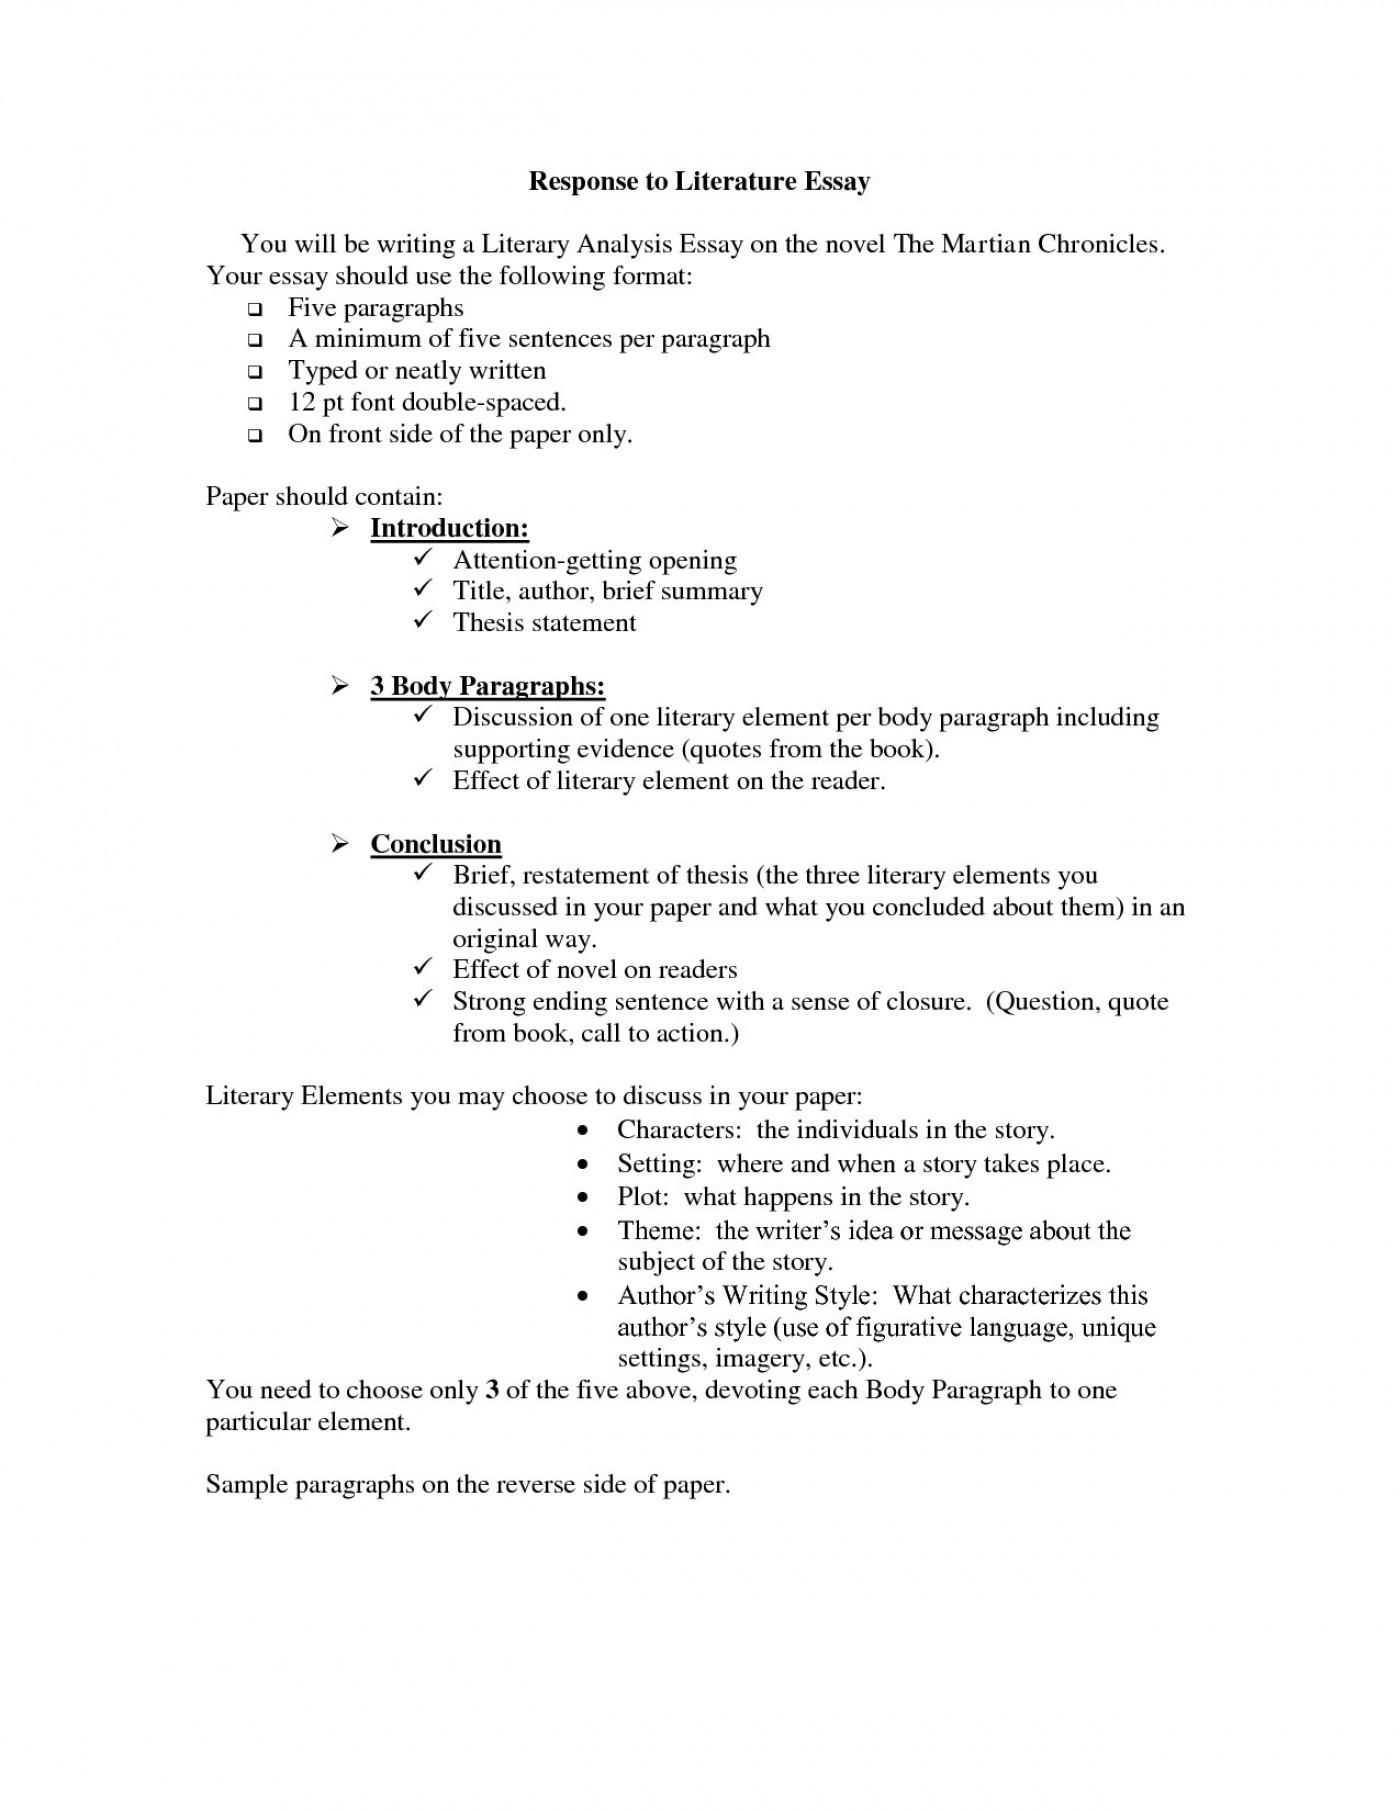 Literaryysis Essay Example High School